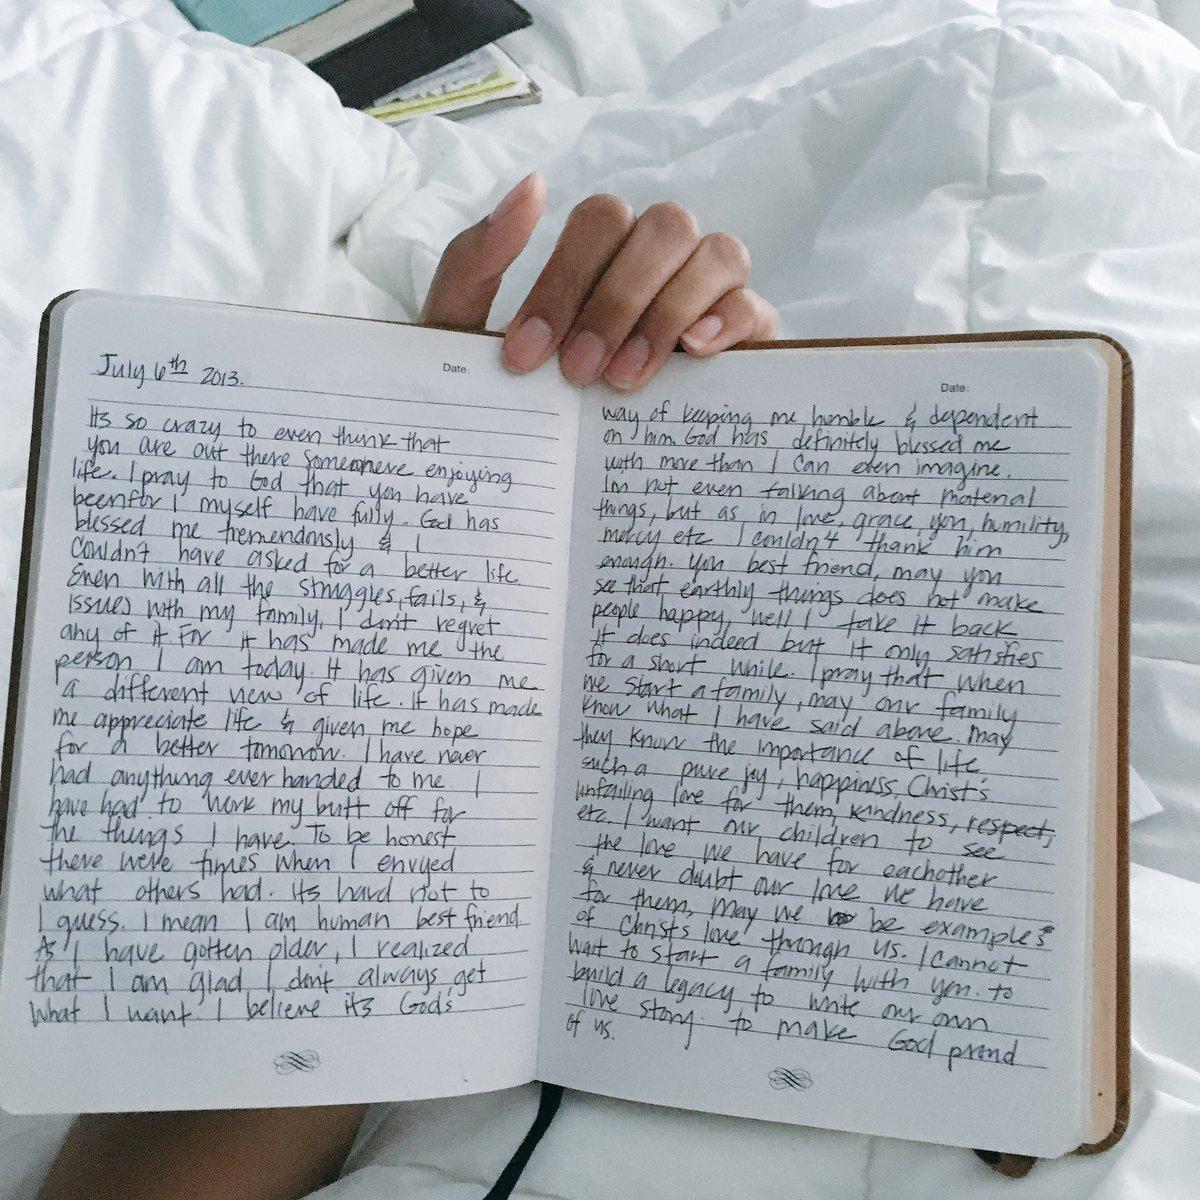 S. on Twitter: Kept a journal for my future husband full